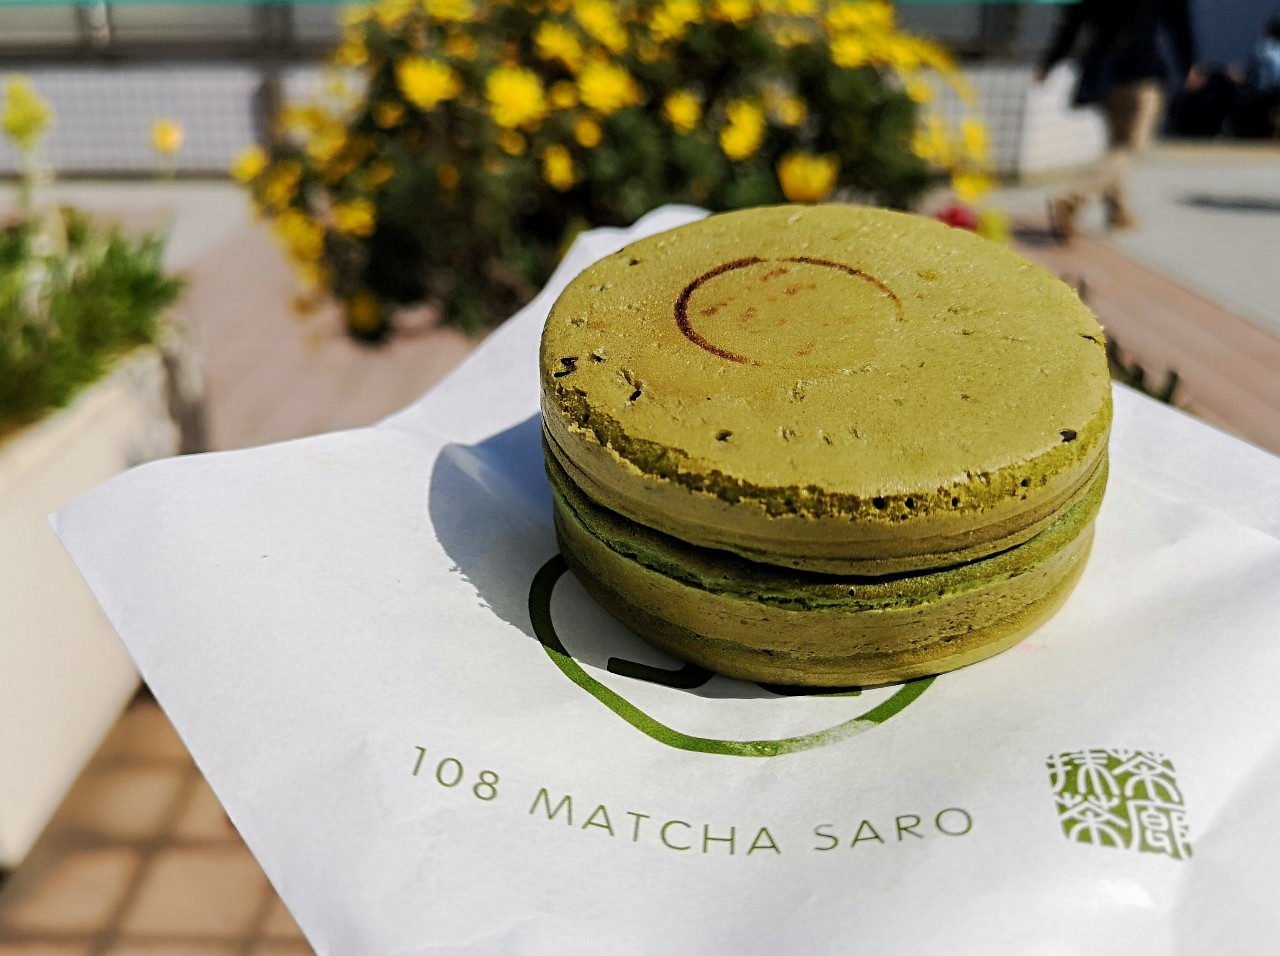 108matchasaro大判焼き抹茶